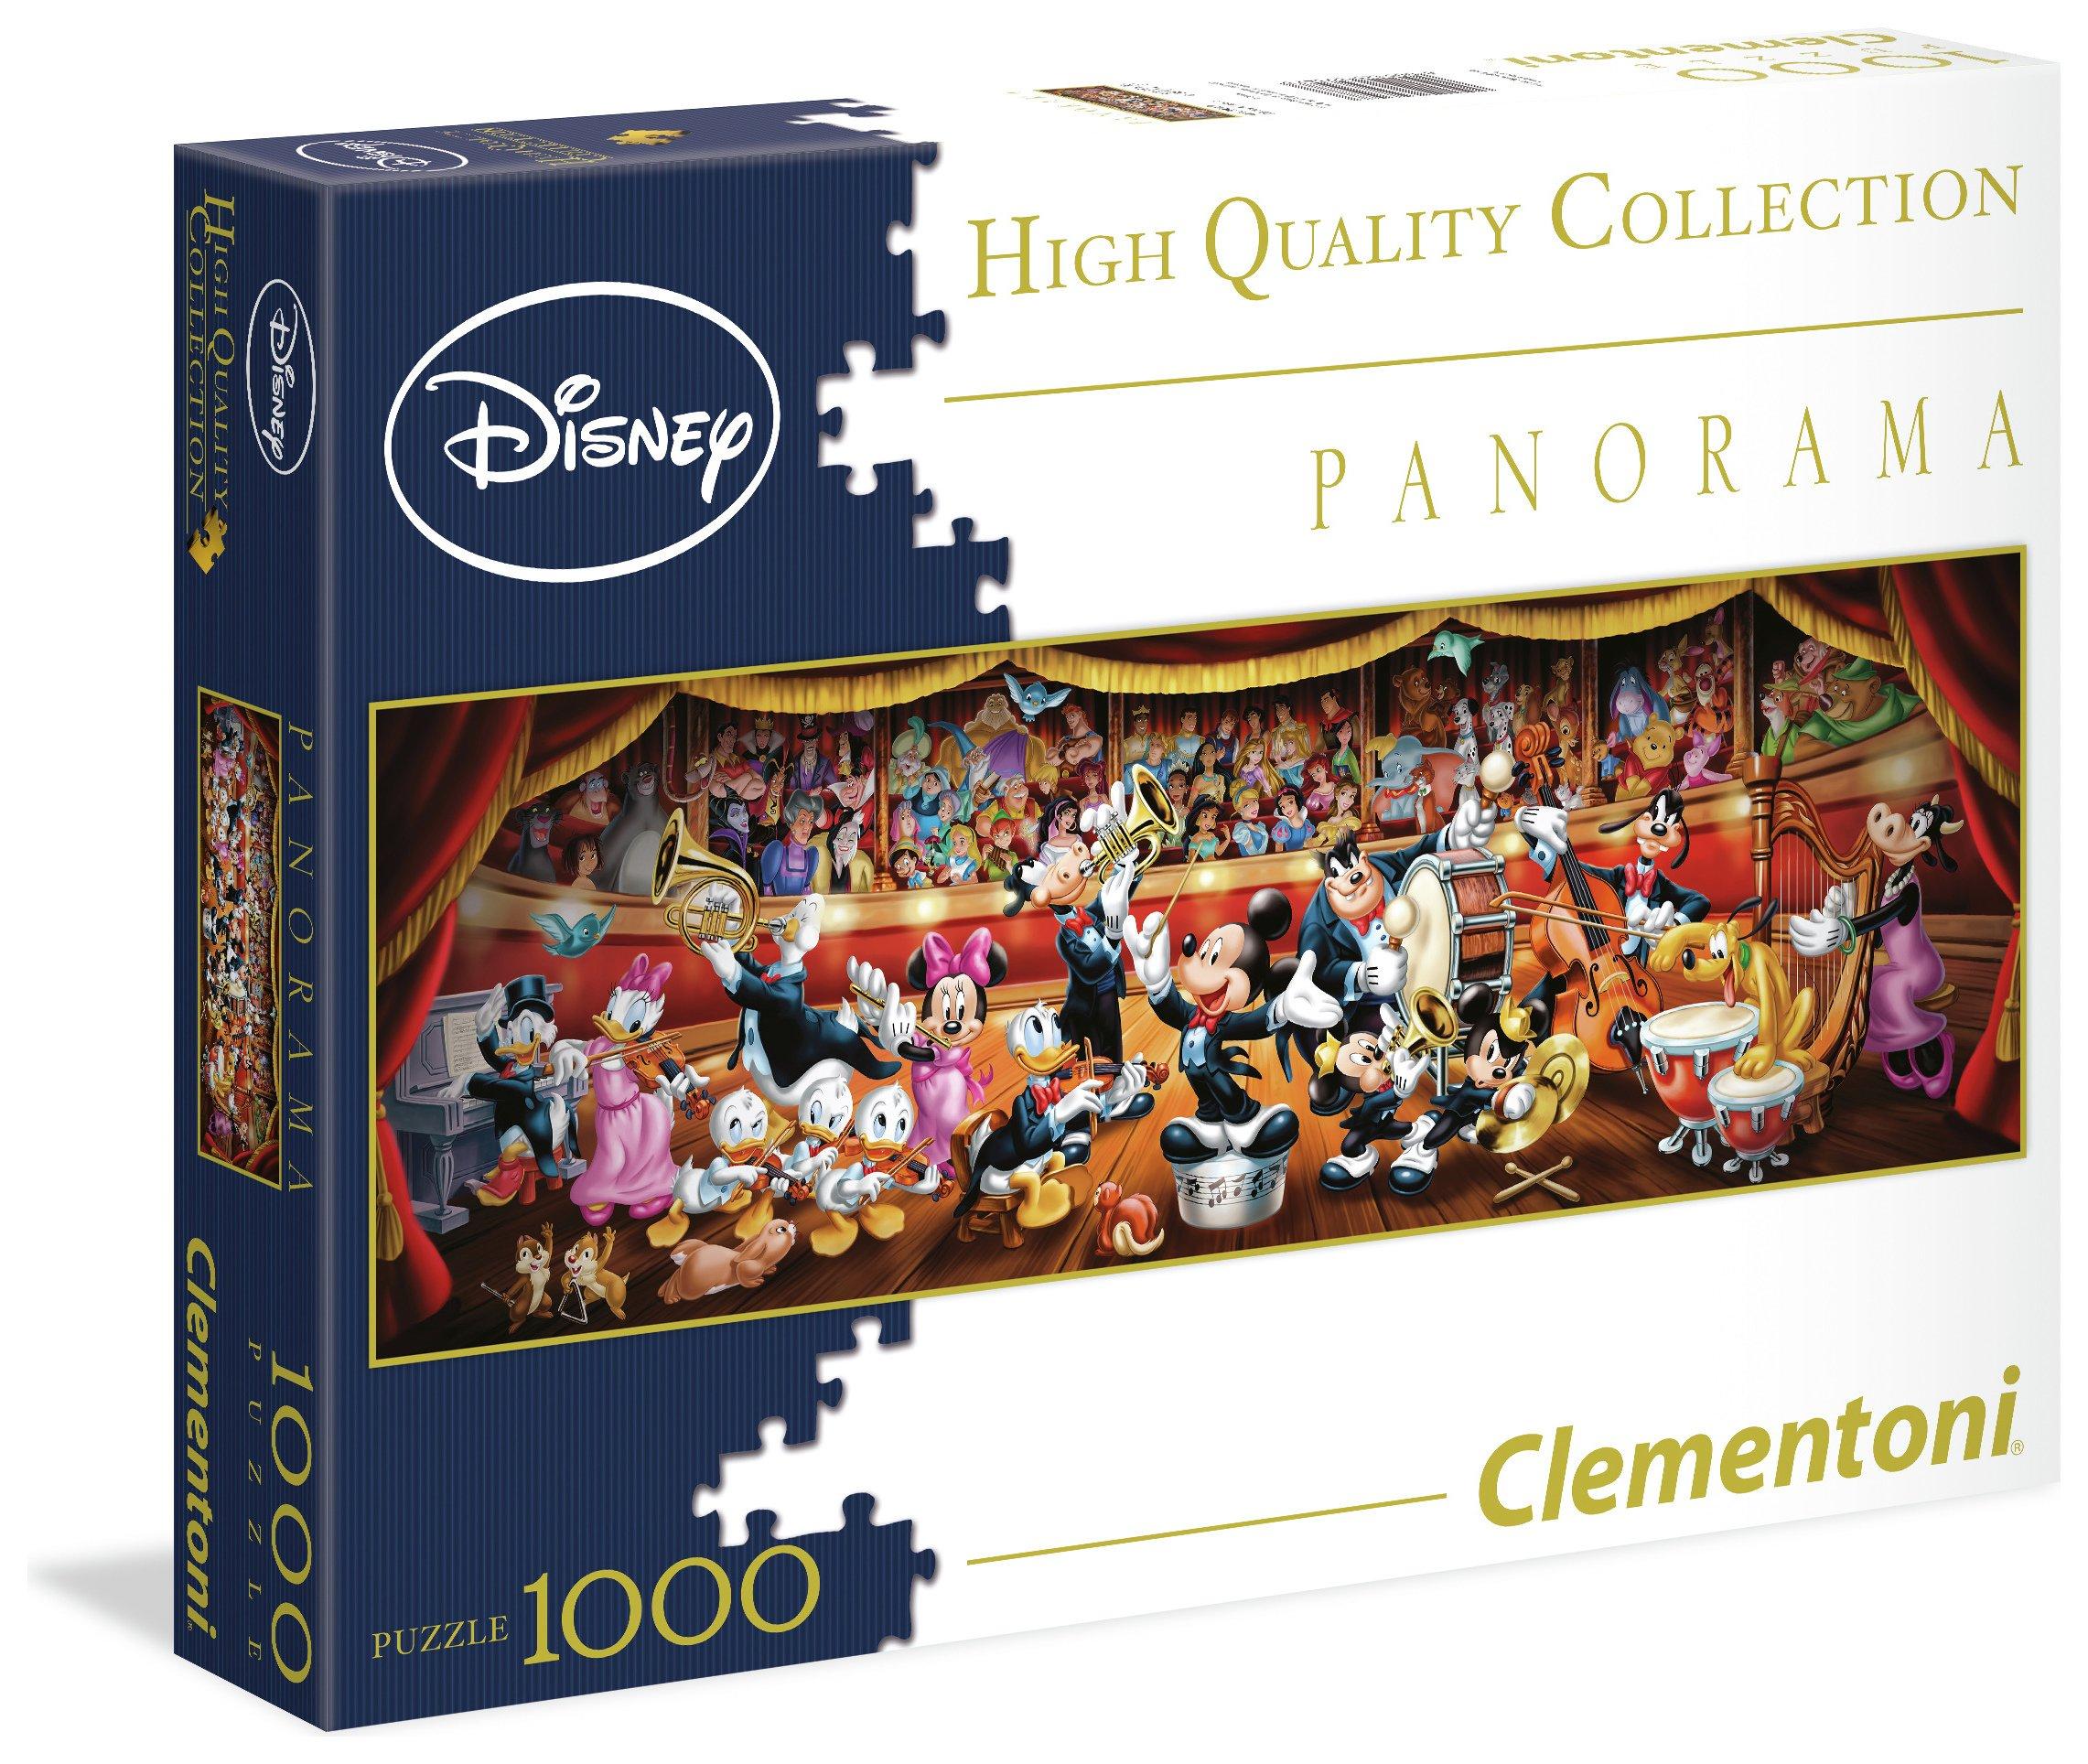 Image of Disney 1000 Piece - Panoramic Classic Puzzle.